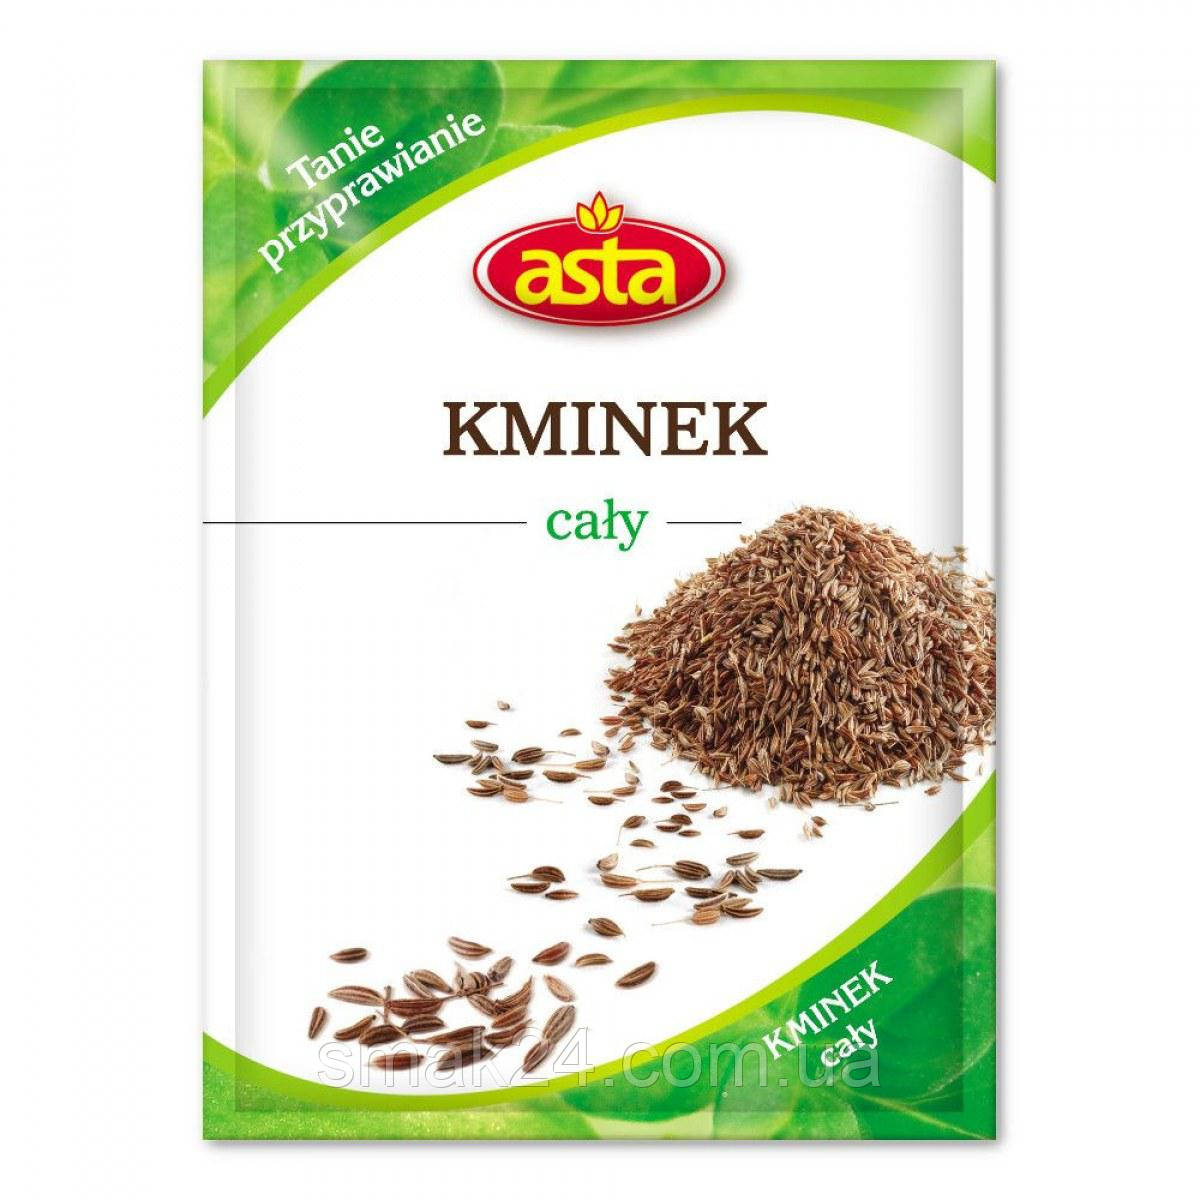 Тмин (семена) Kminek Asta 16г  Польша